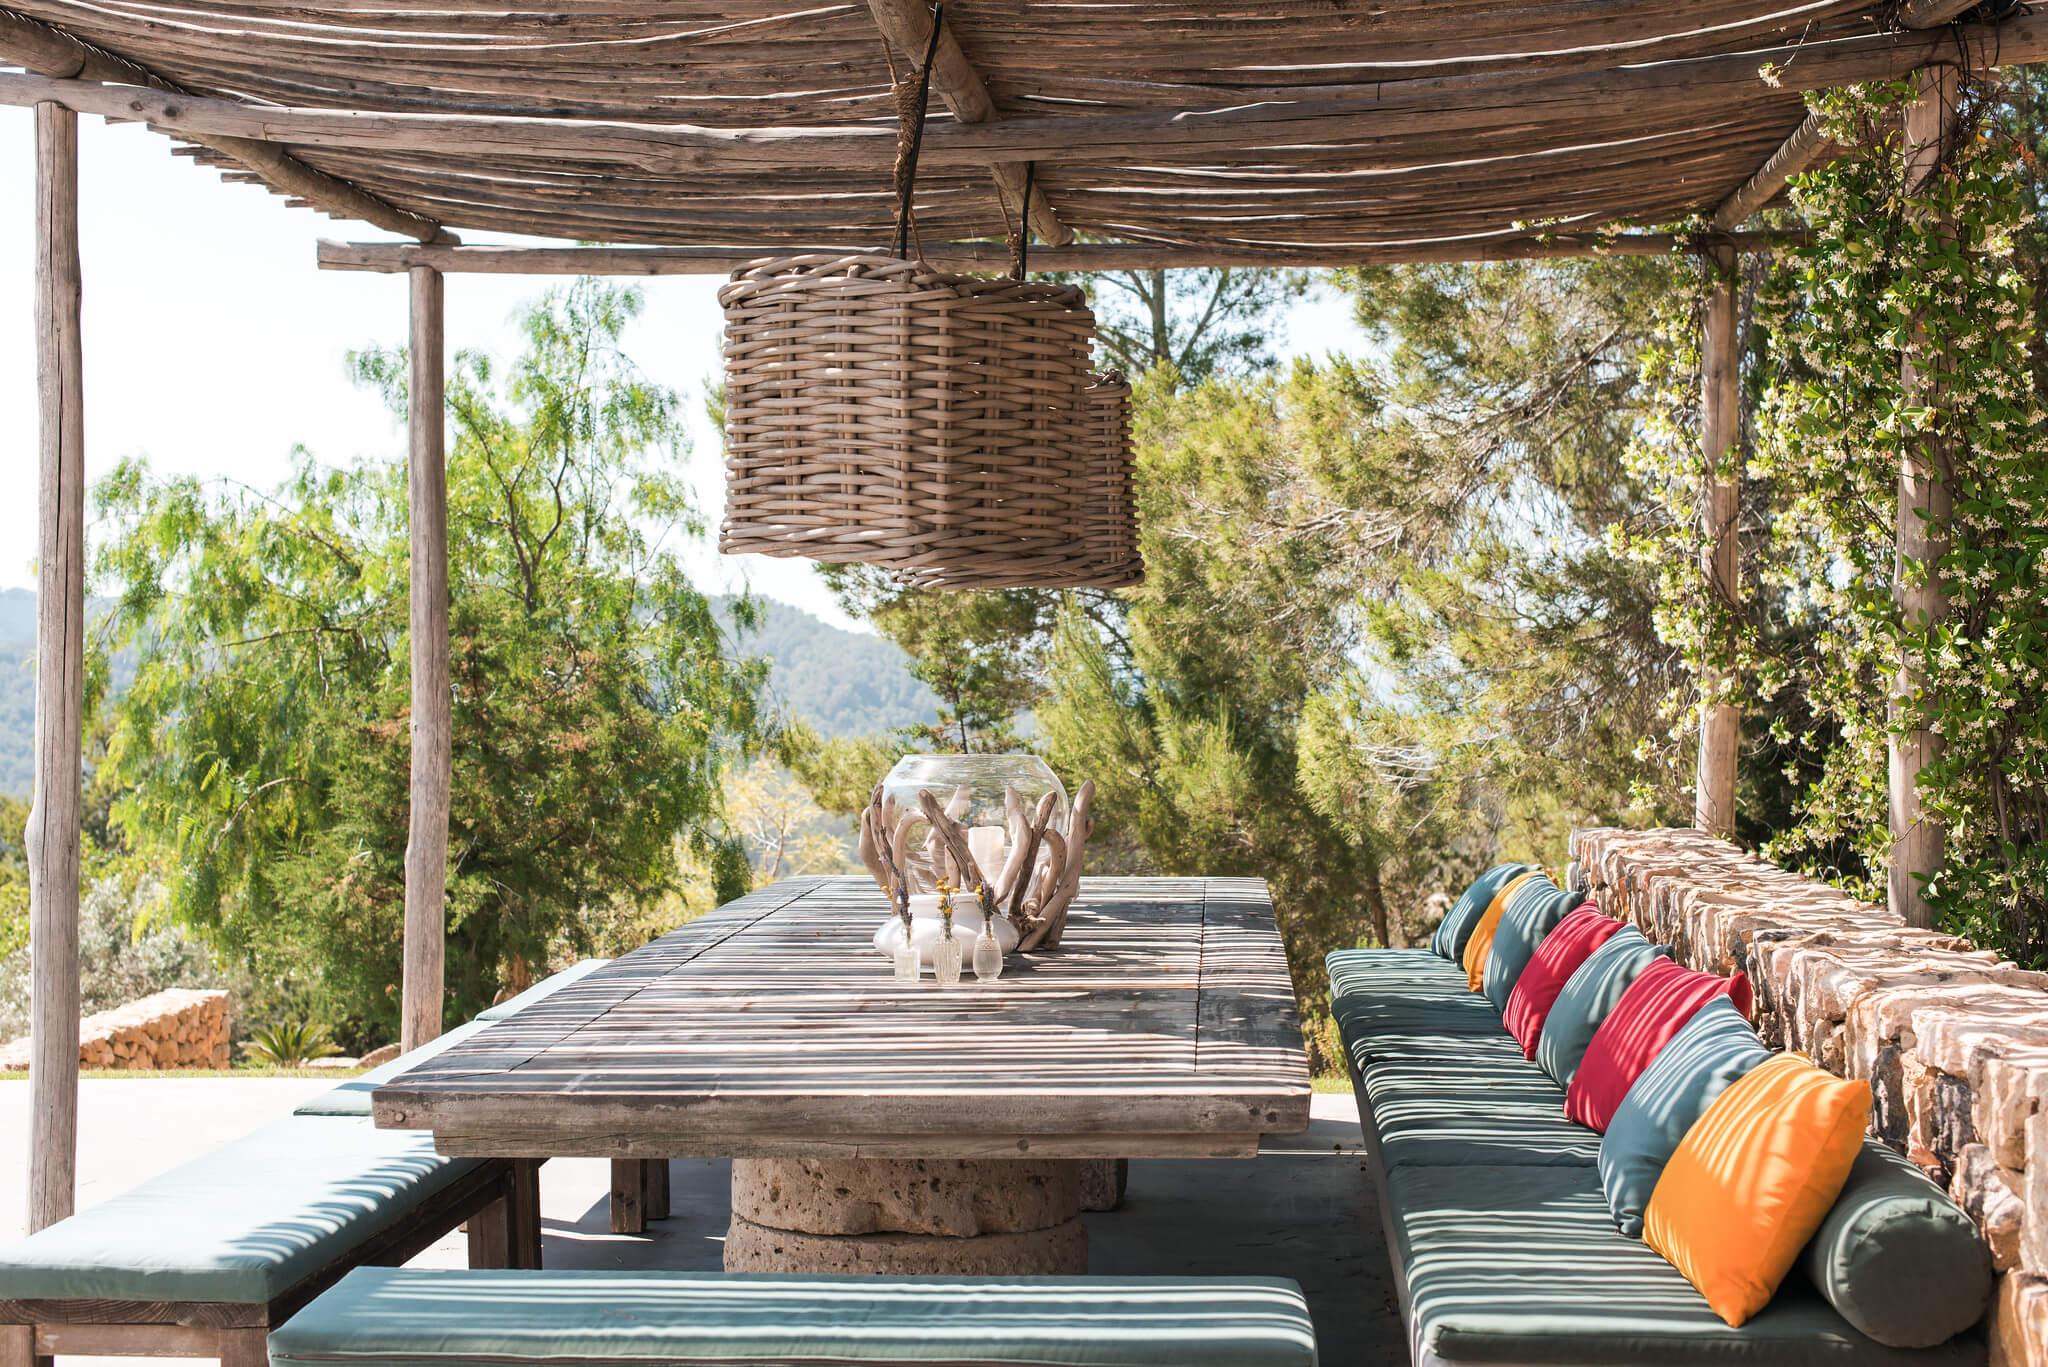 https://www.white-ibiza.com/wp-content/uploads/2020/05/white-ibiza-villas-can-zama-outside-dining-two.jpg